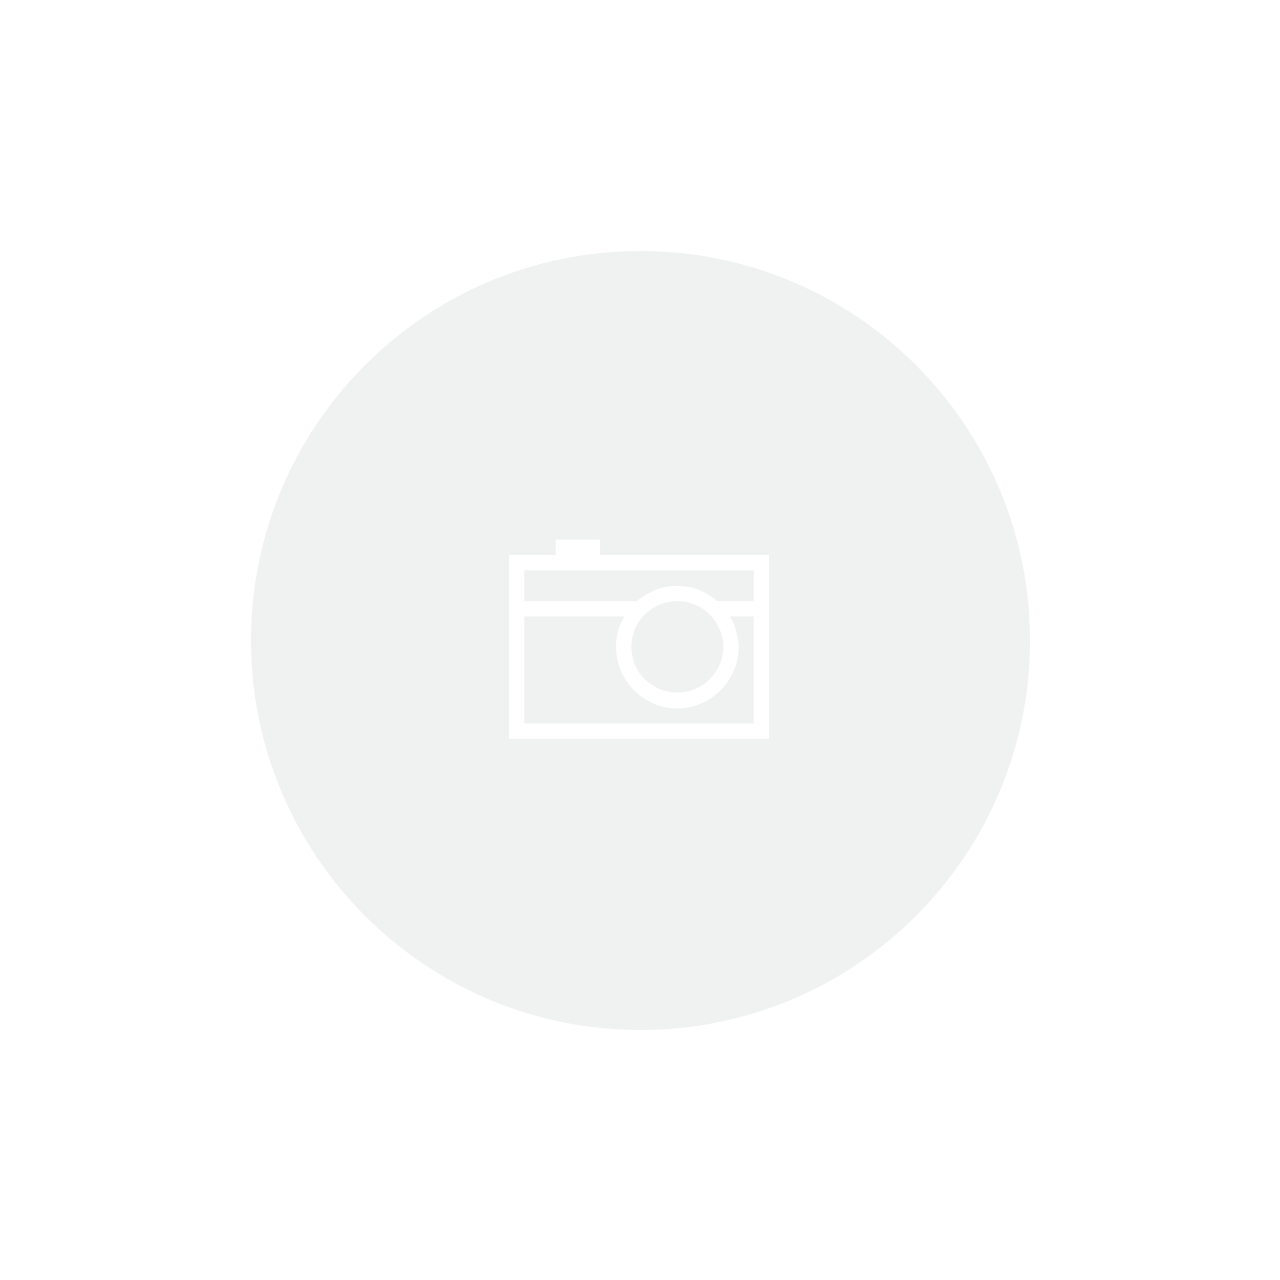 Lixeira t-force 100 Litros Preto e Azul Empresarial Tramonti